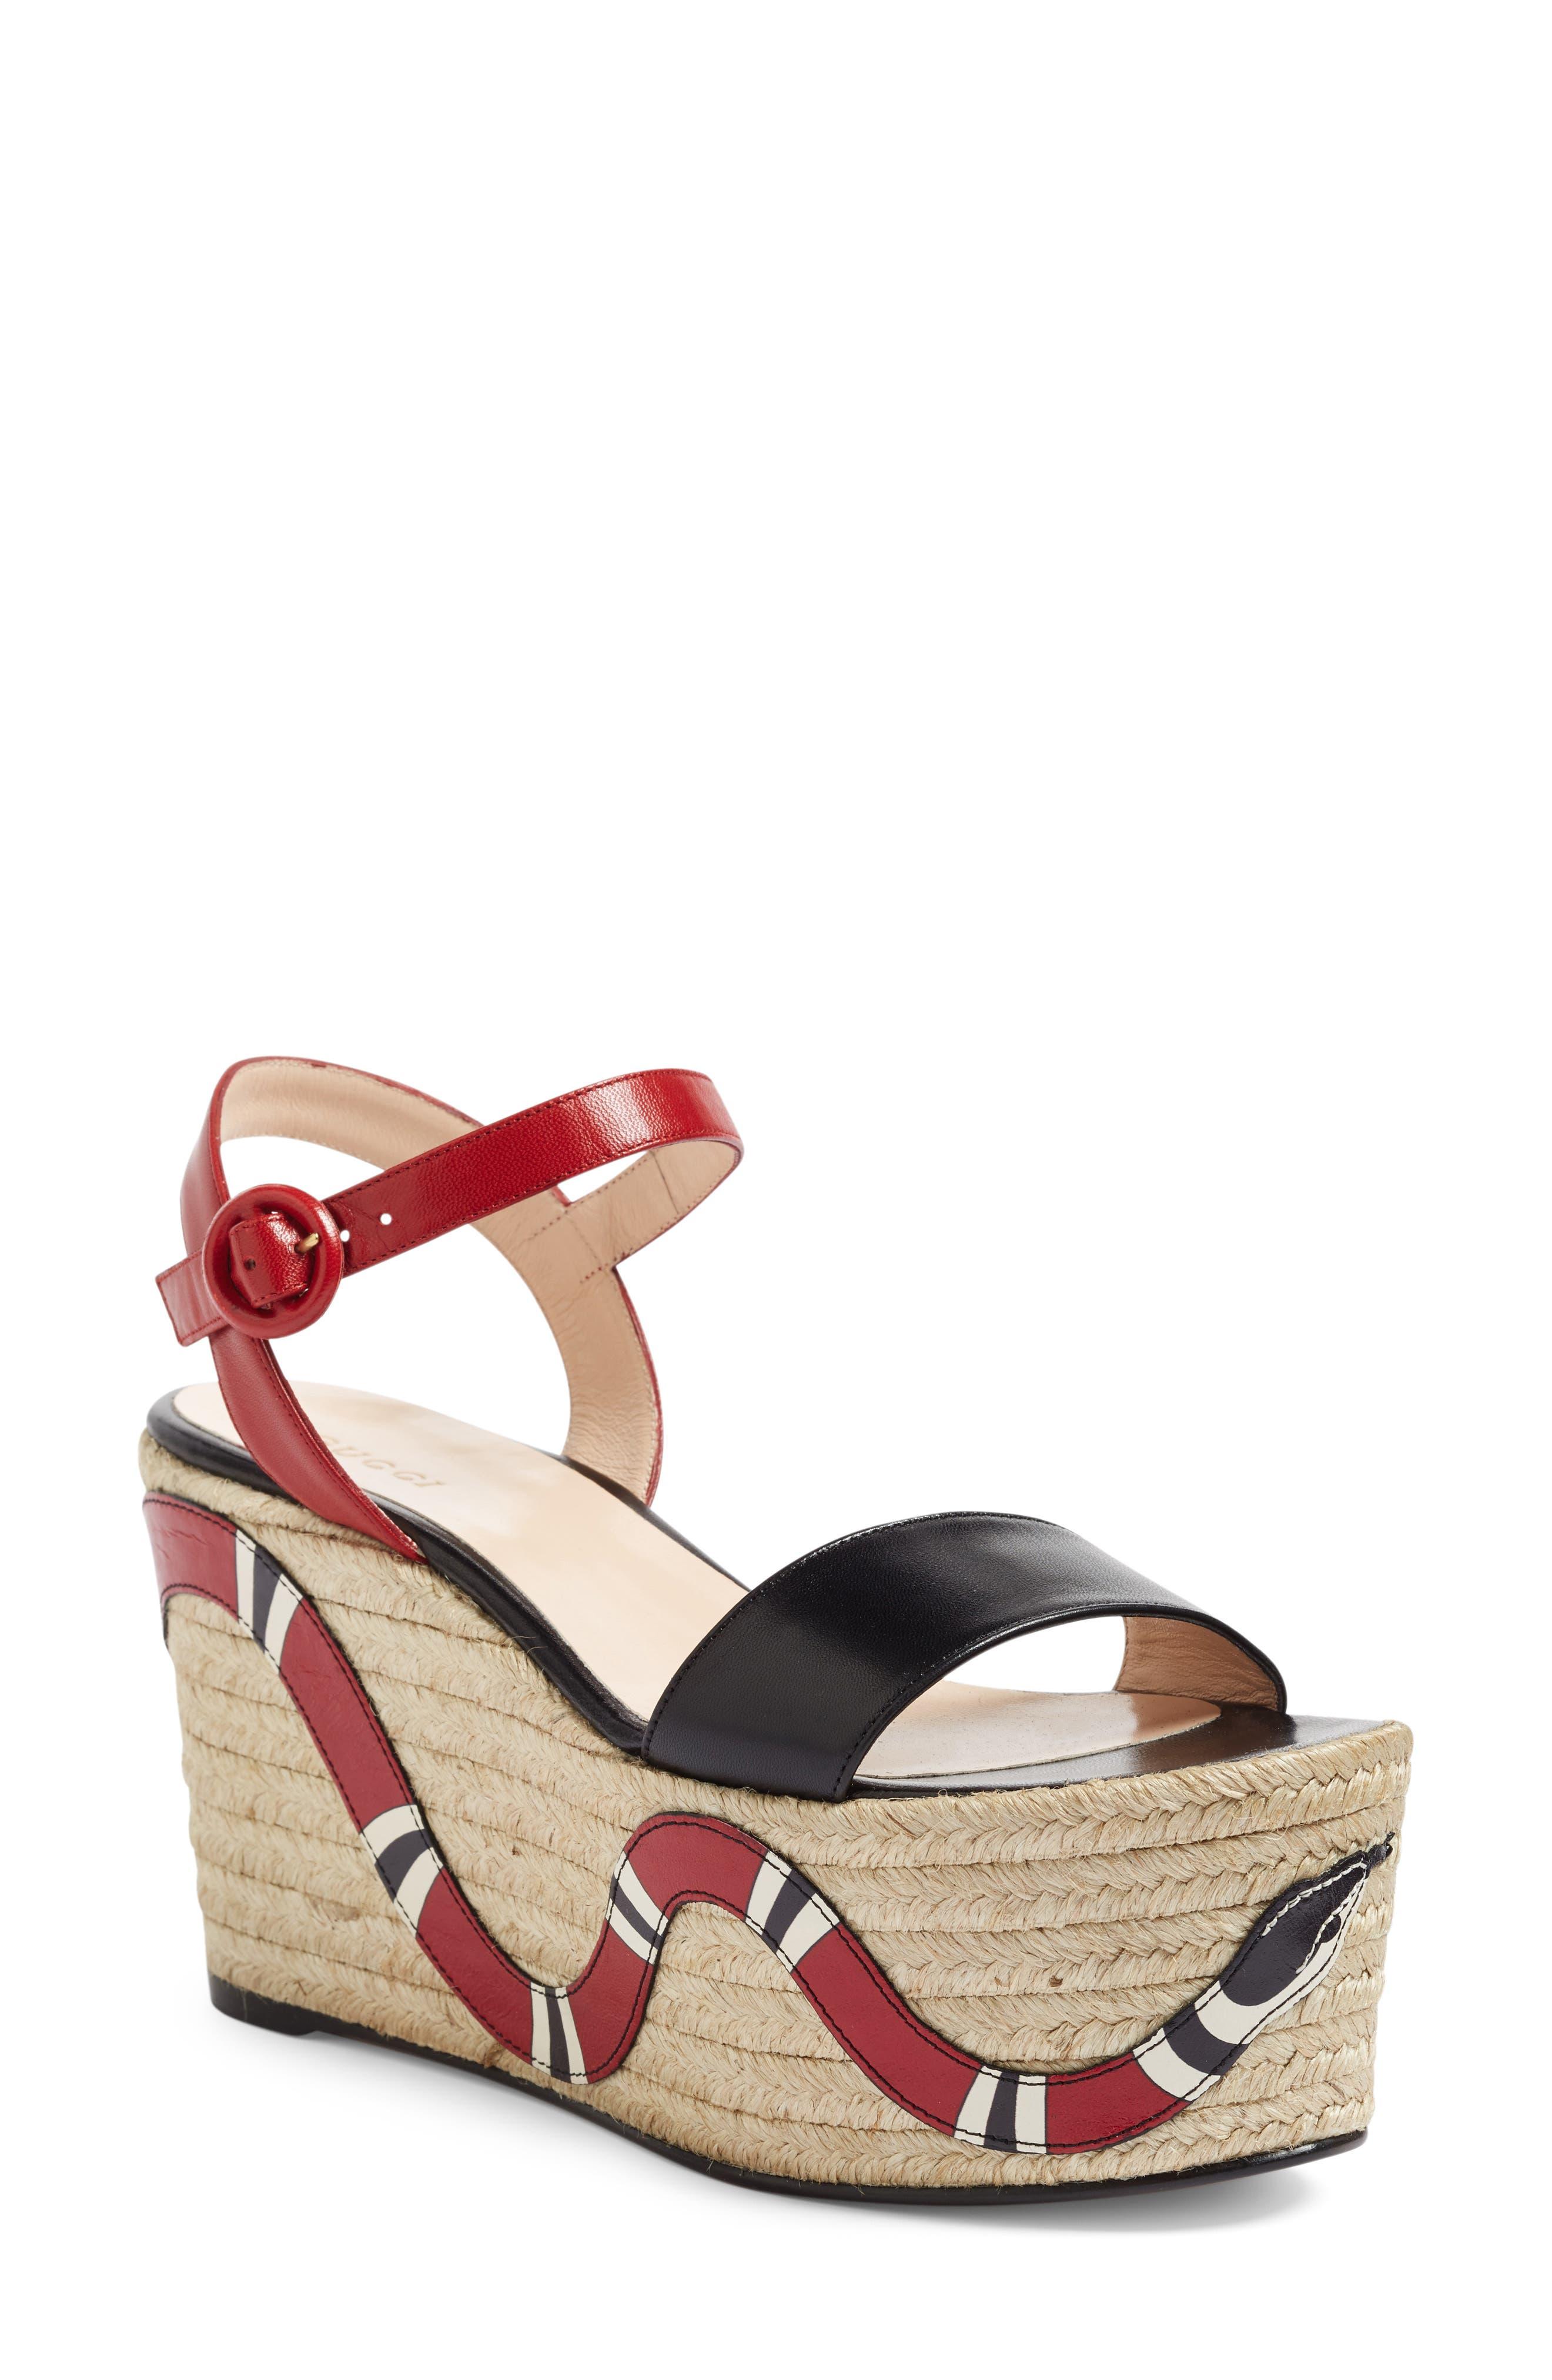 Alternate Image 1 Selected - Gucci Barbette Espadrille Wedge Sandal (Women)